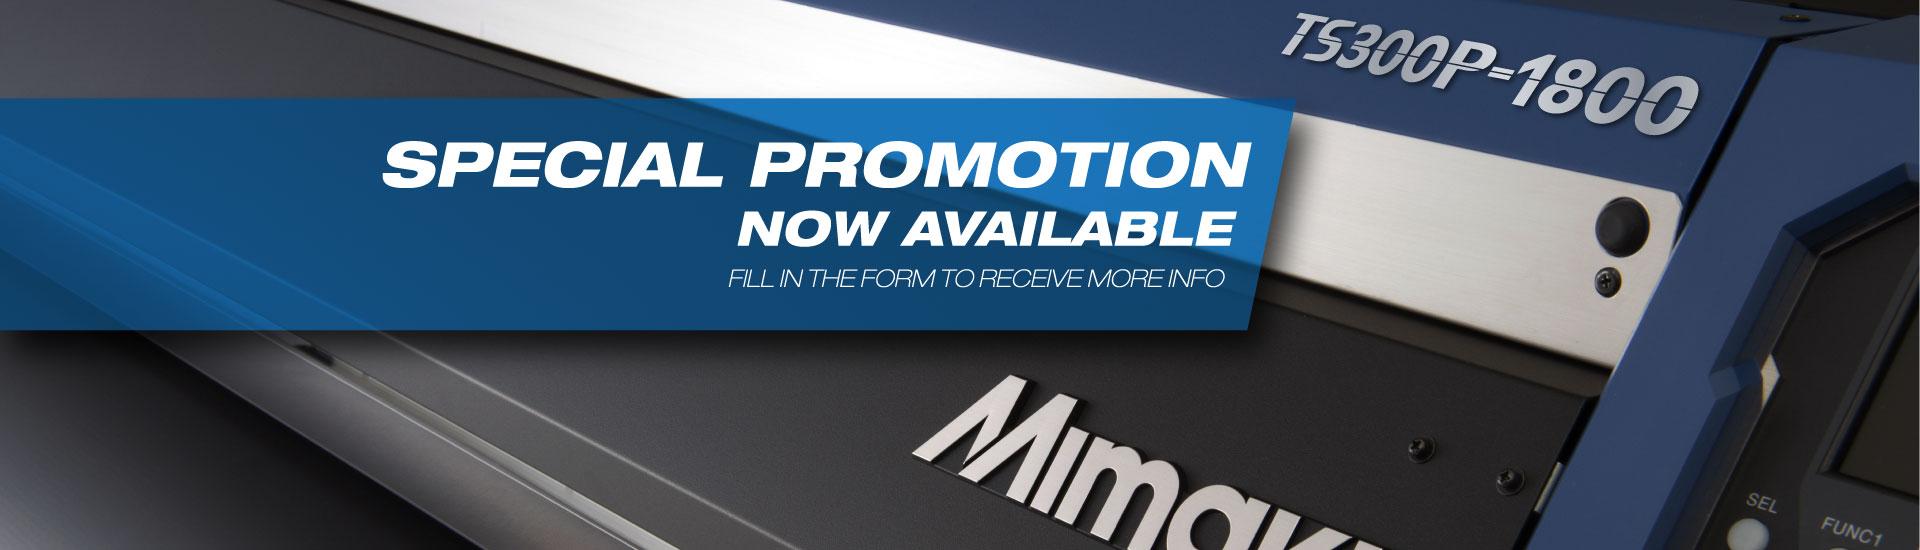 TS300P-1800 Promotion